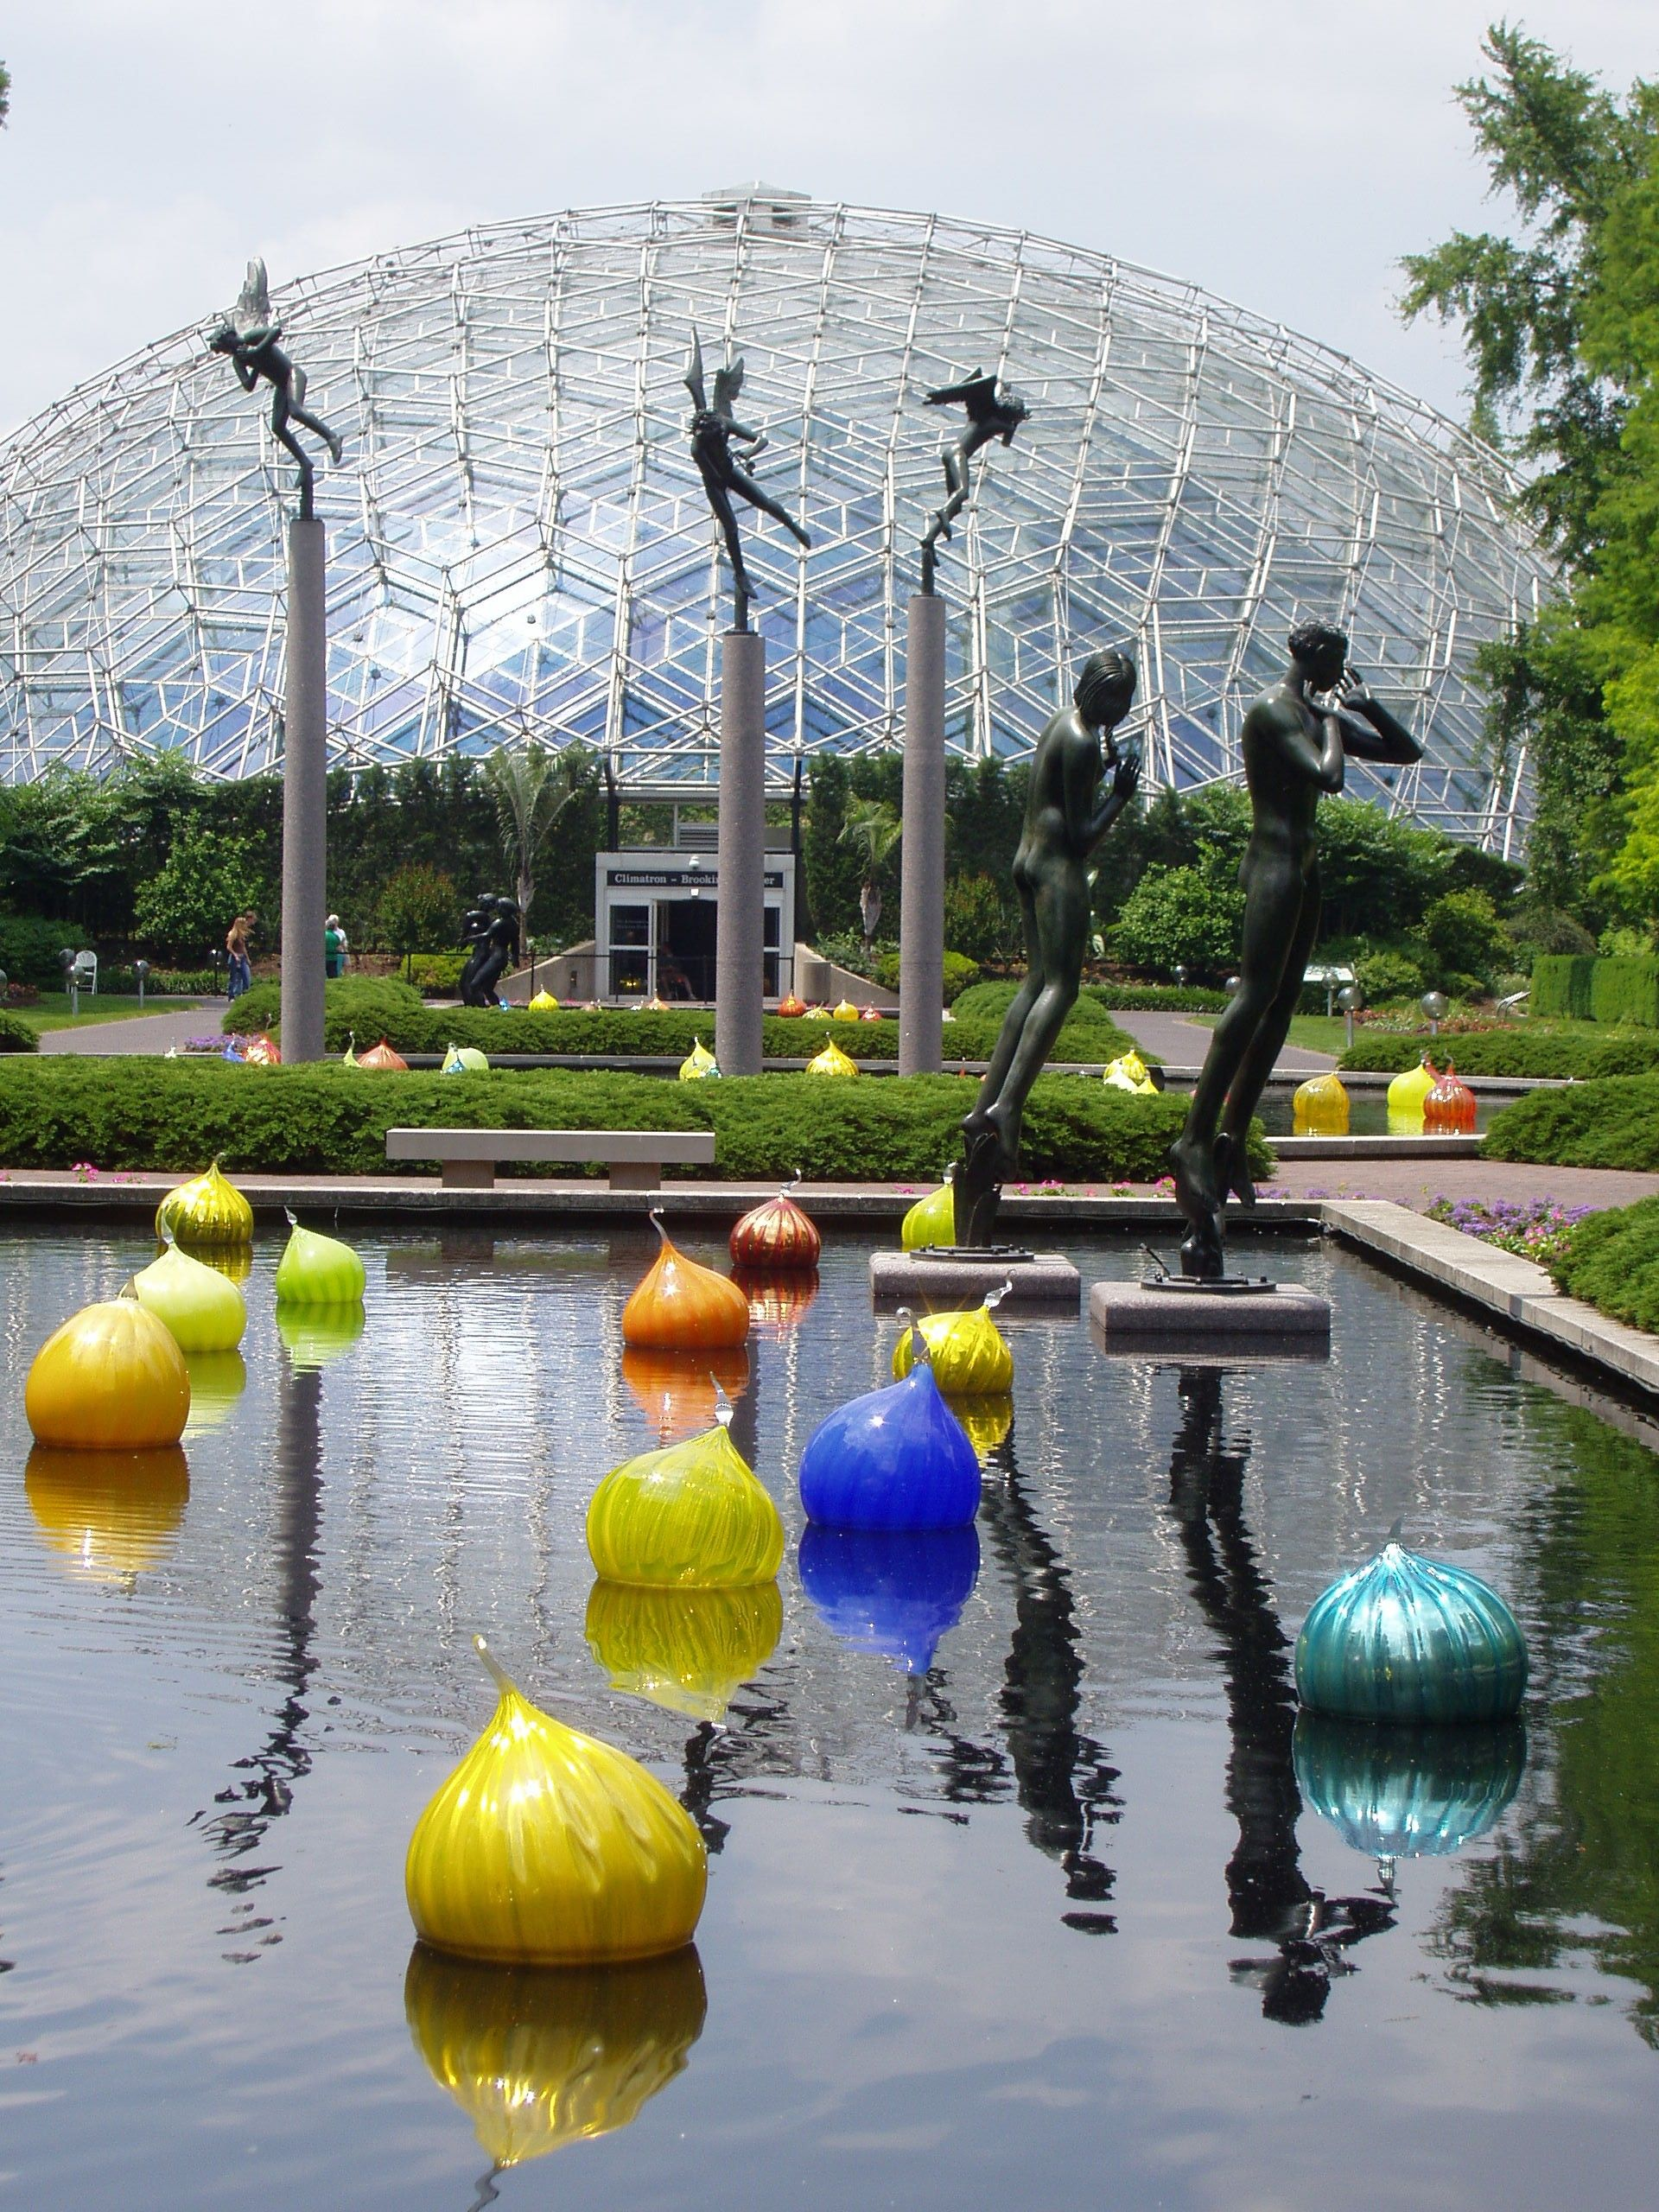 781ae3a5a800ba9e60014d1d580e42cd - Dale Chihuly St Louis Botanical Gardens